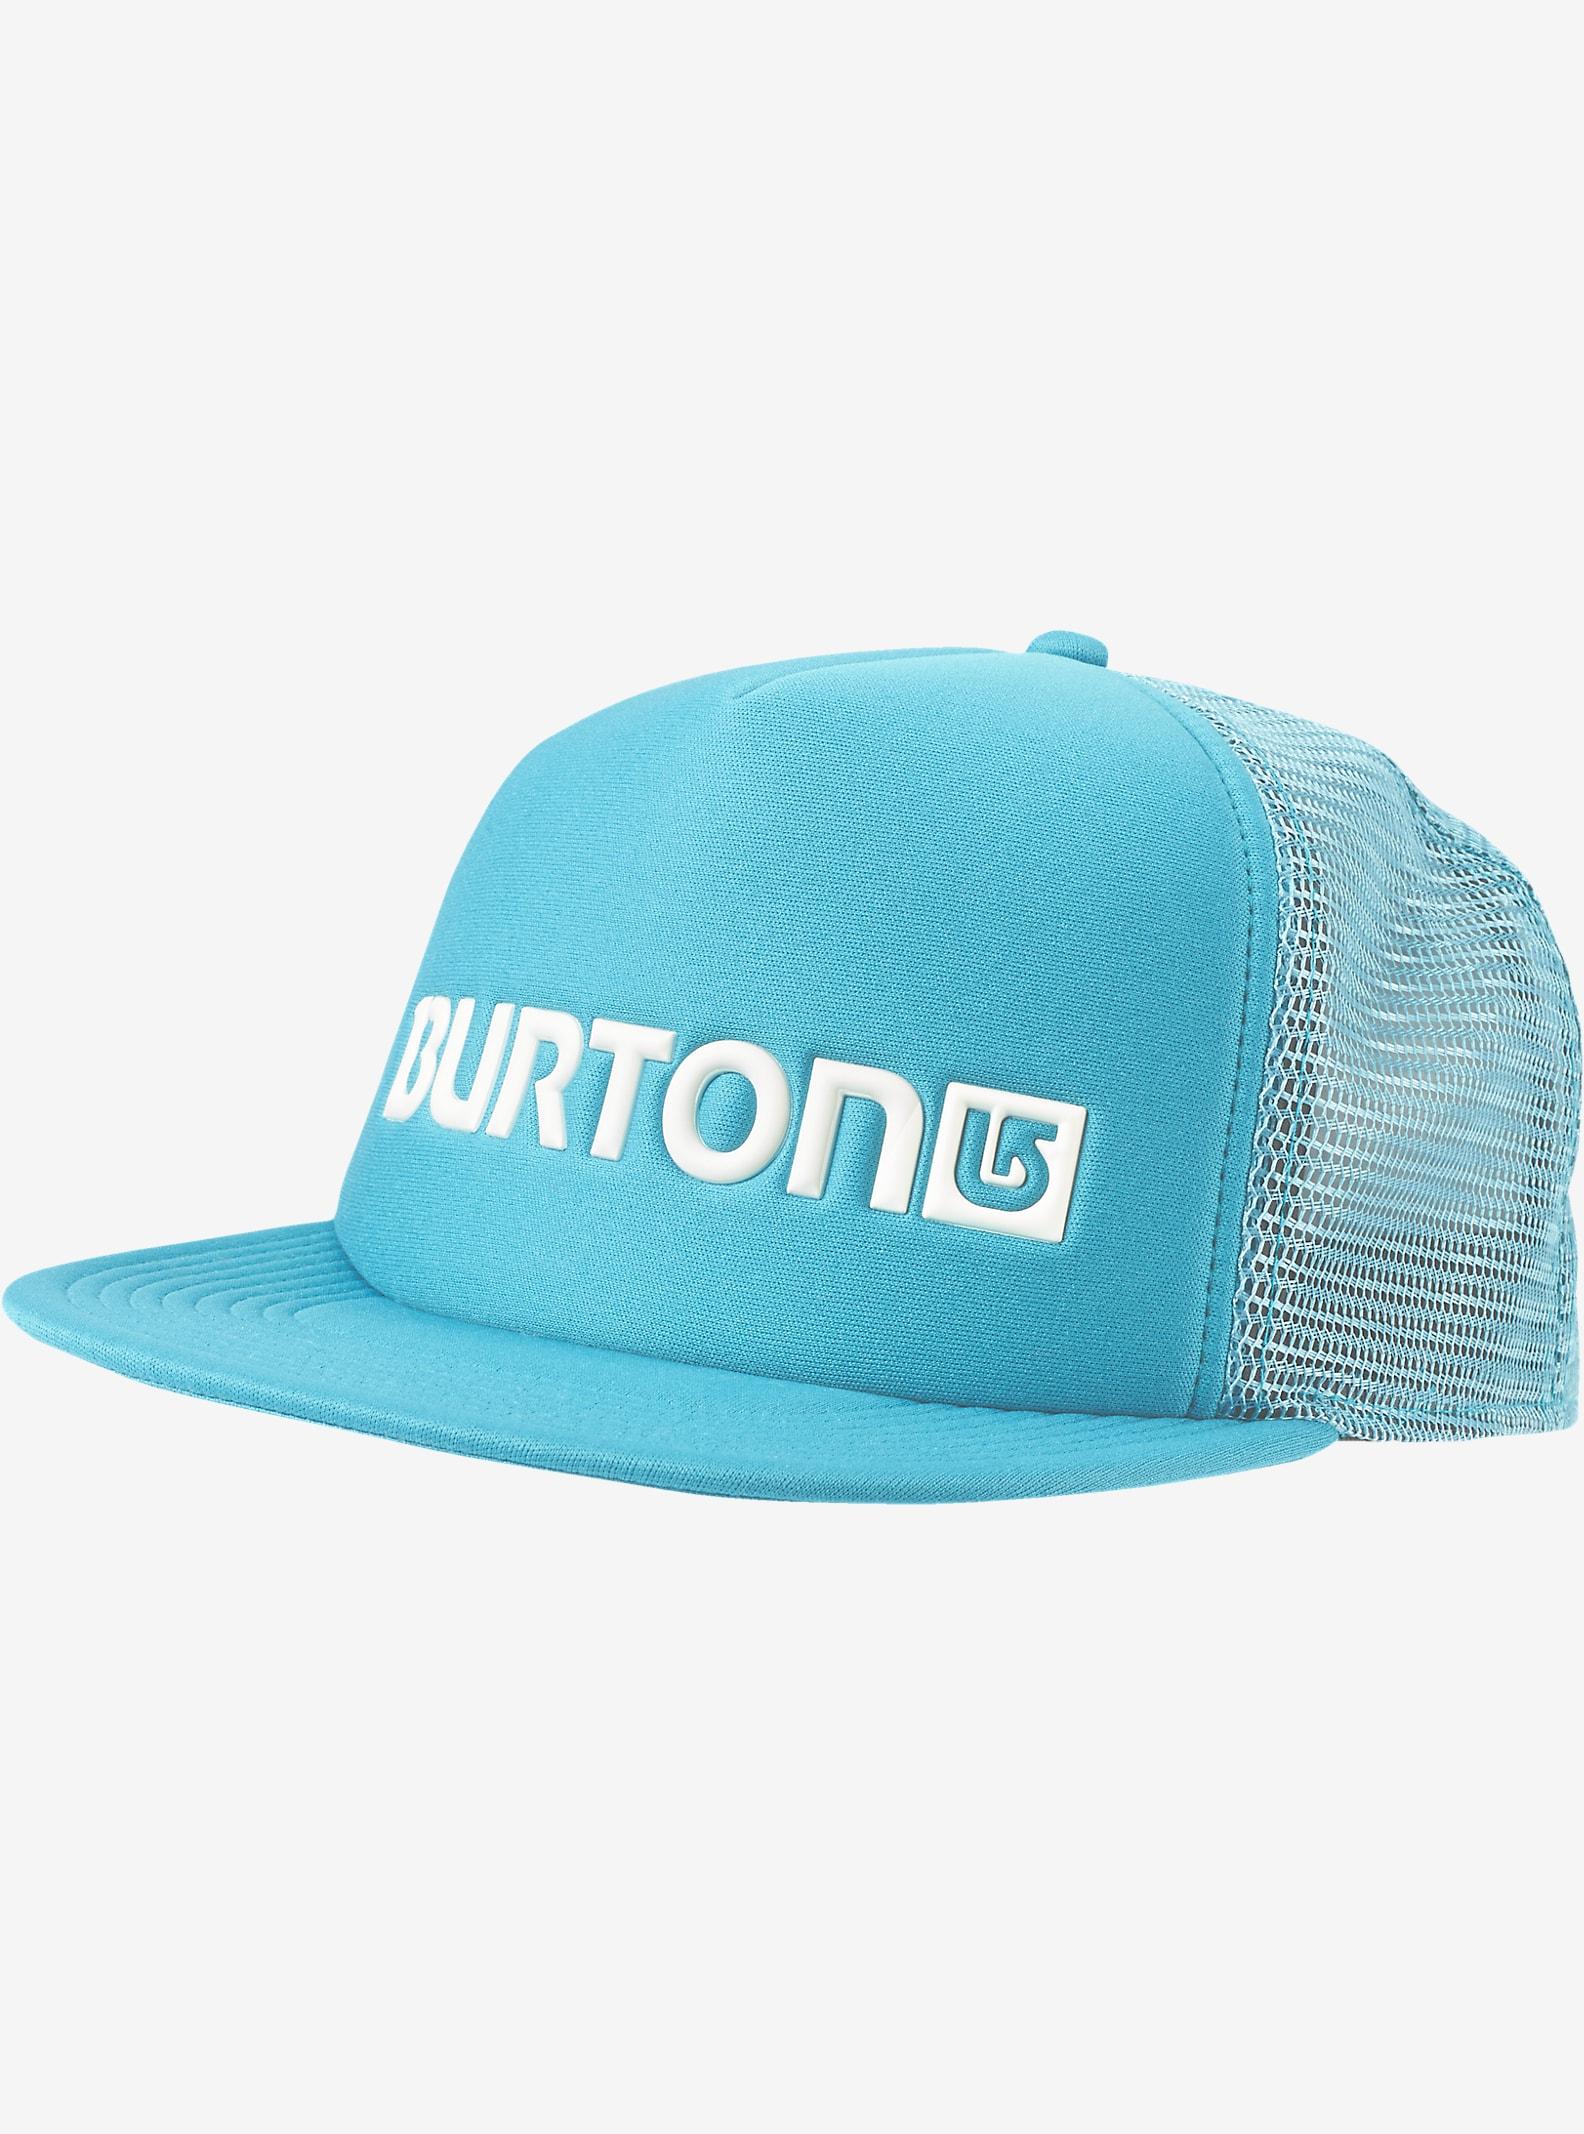 Burton Shadow Trucker Hat shown in Caneel Bay